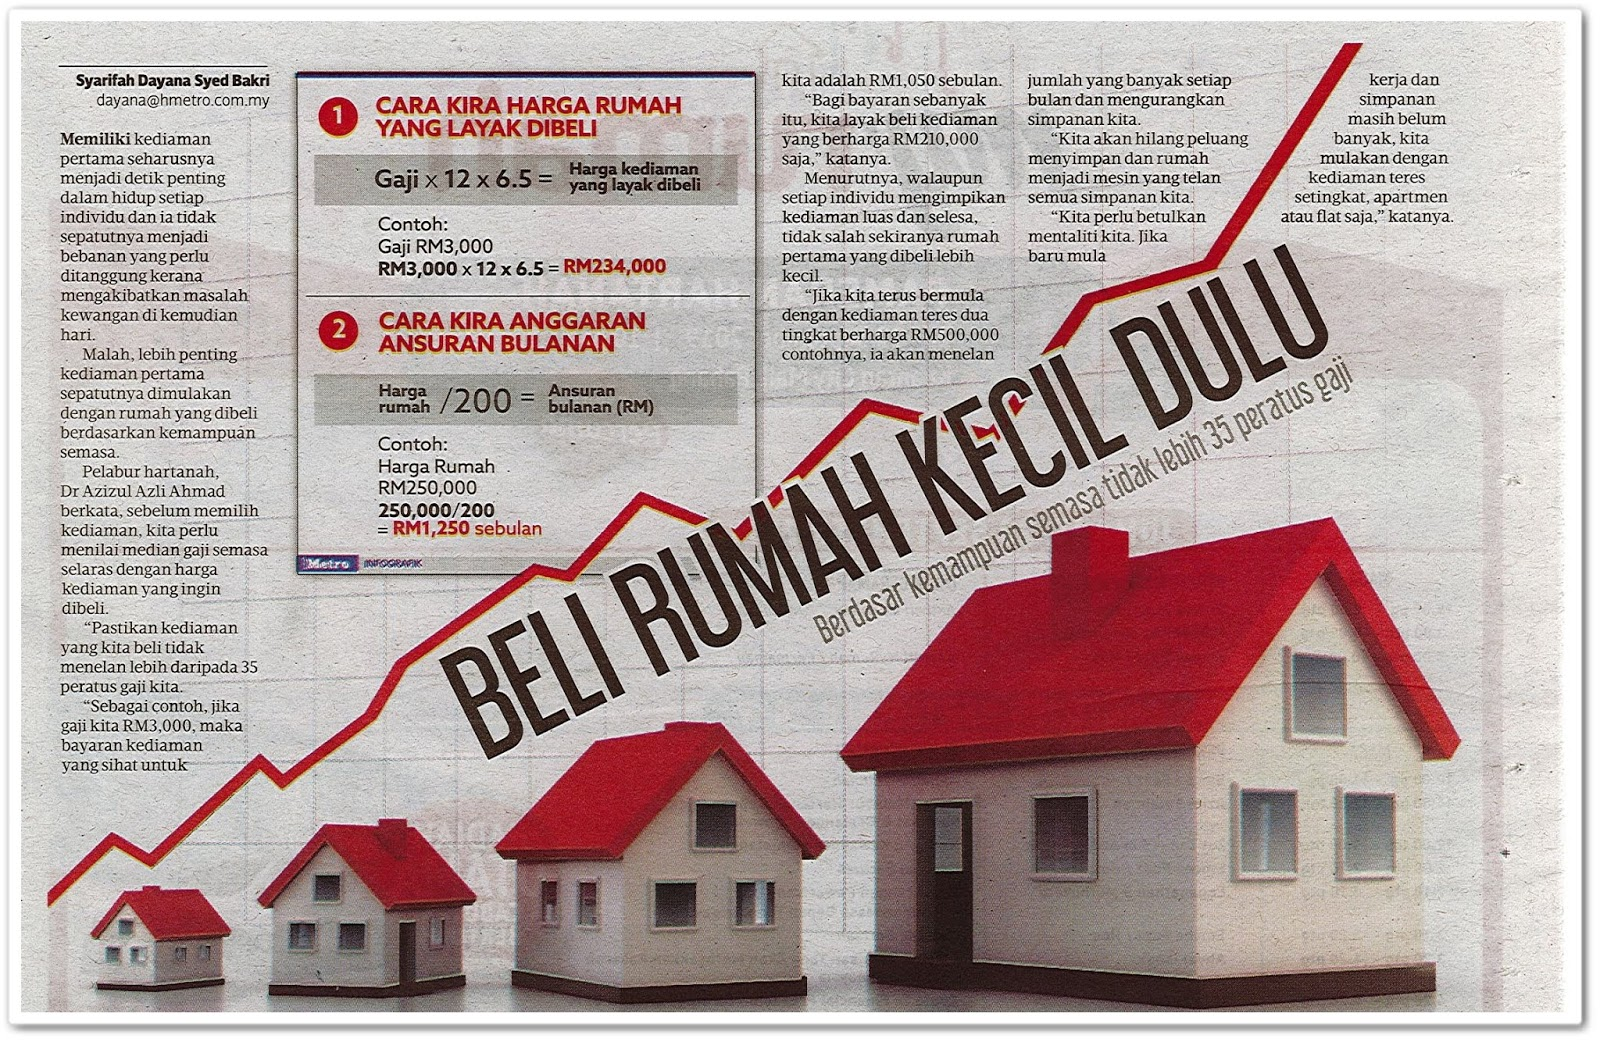 Beli rumah kecil dulu ; Berdasar kemampuan semasa tidak lebih 35 peratus gaji